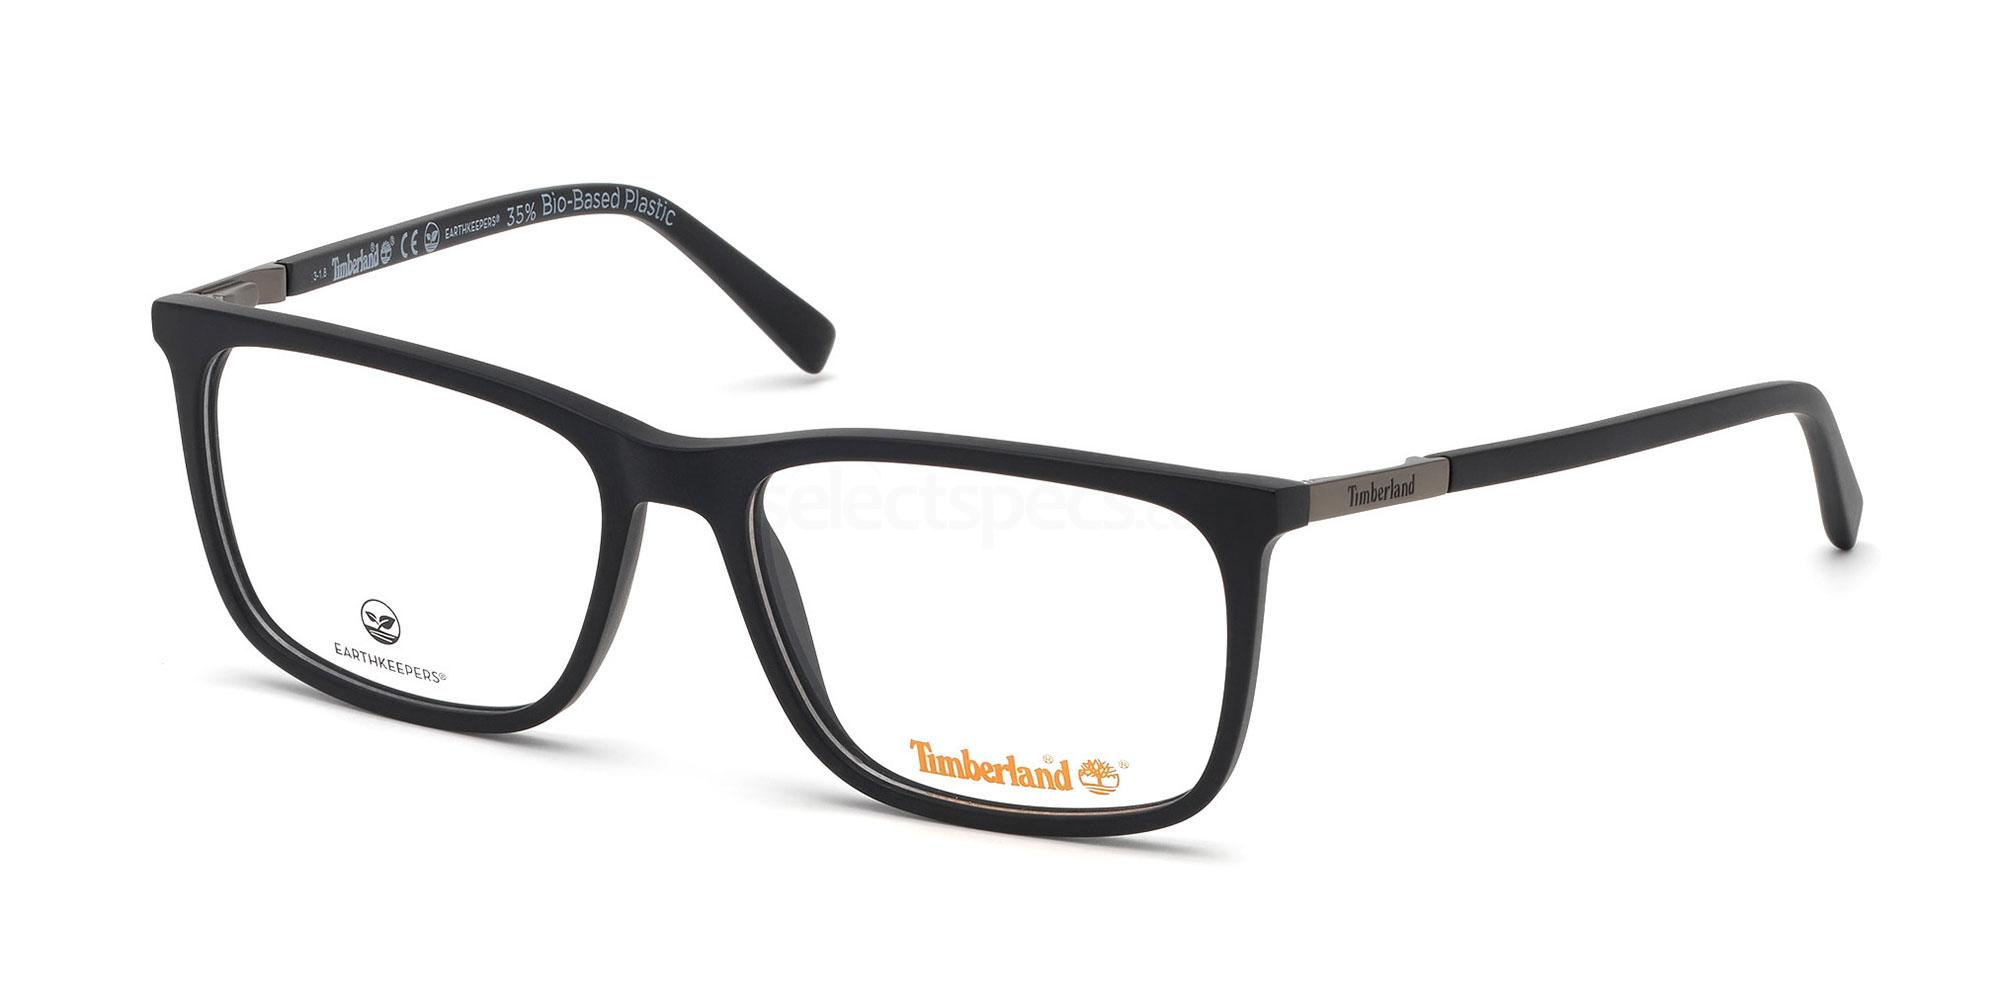 002 TB1619 Glasses, Timberland